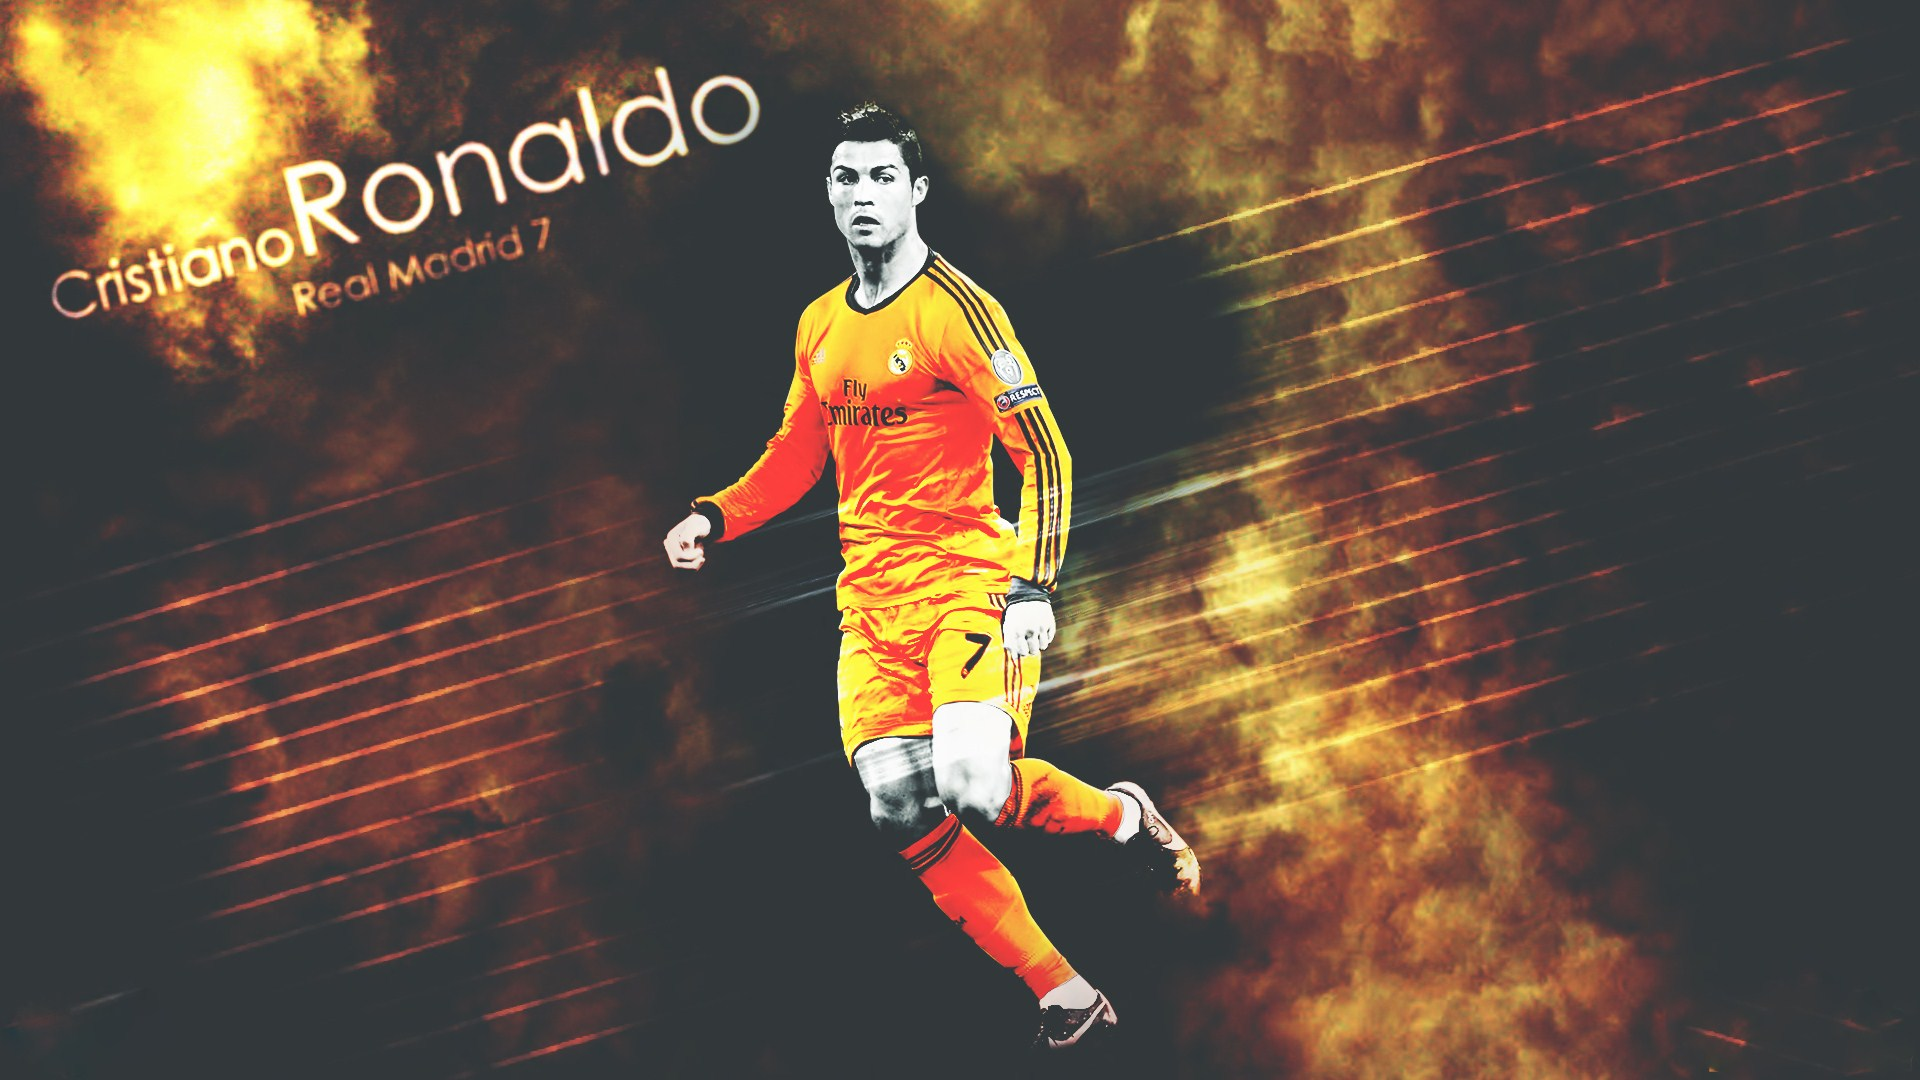 Cr7 Wallpaper Iphone X Cristiano Ronaldo Full Hd Wallpaper And Background Image